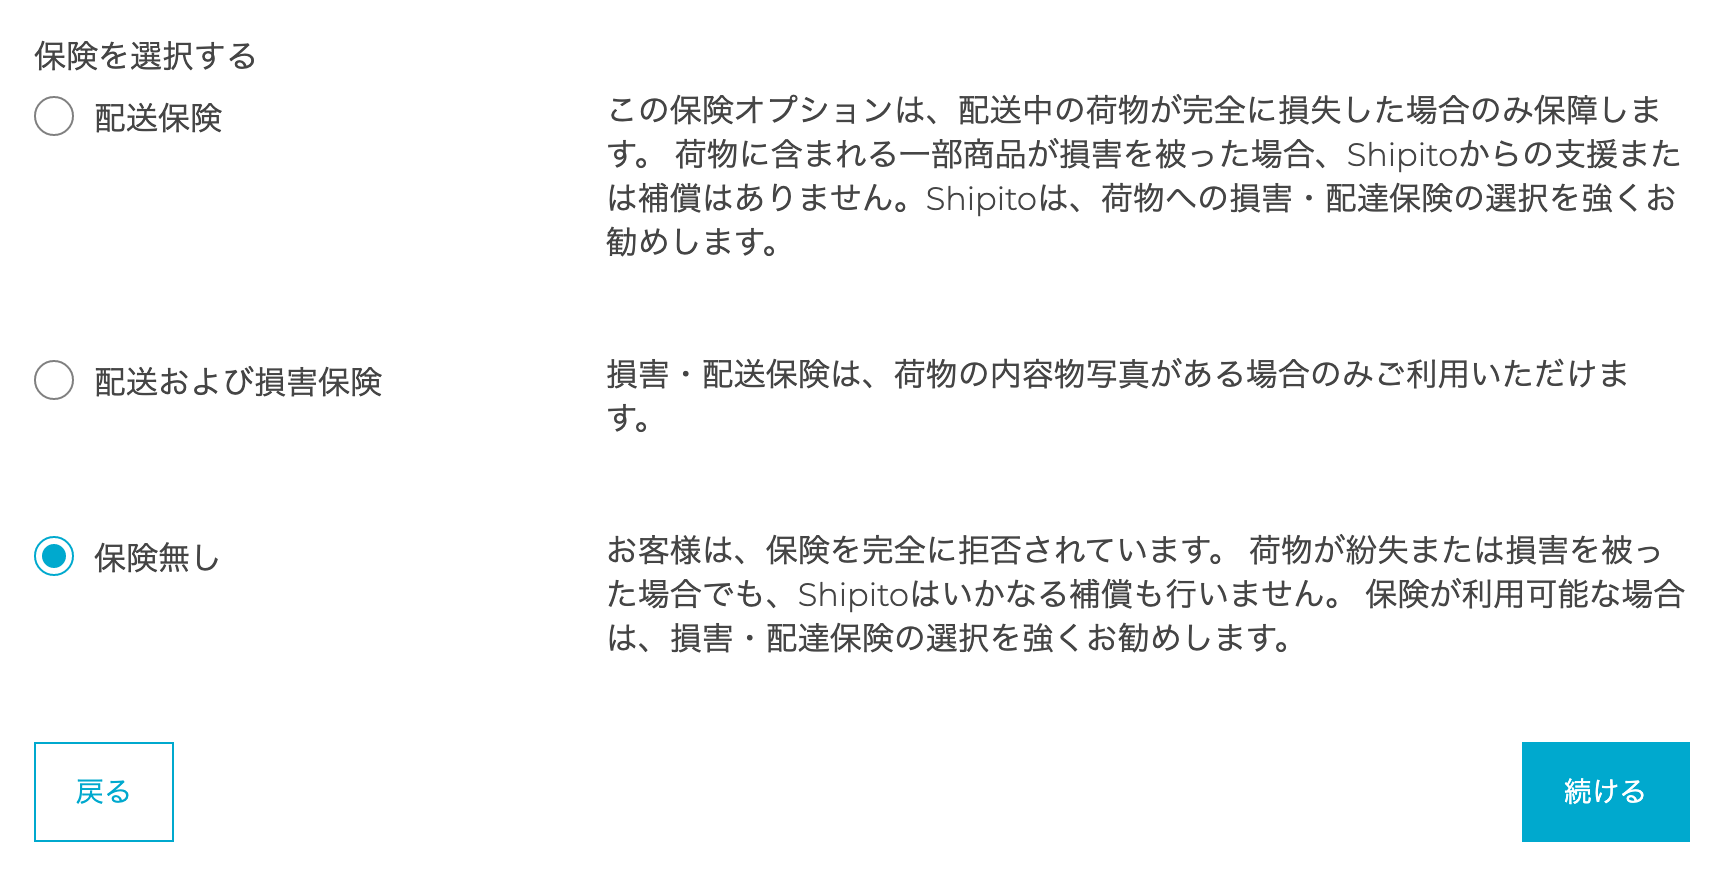 Shipito 配送業者を選び決済 保険の有無